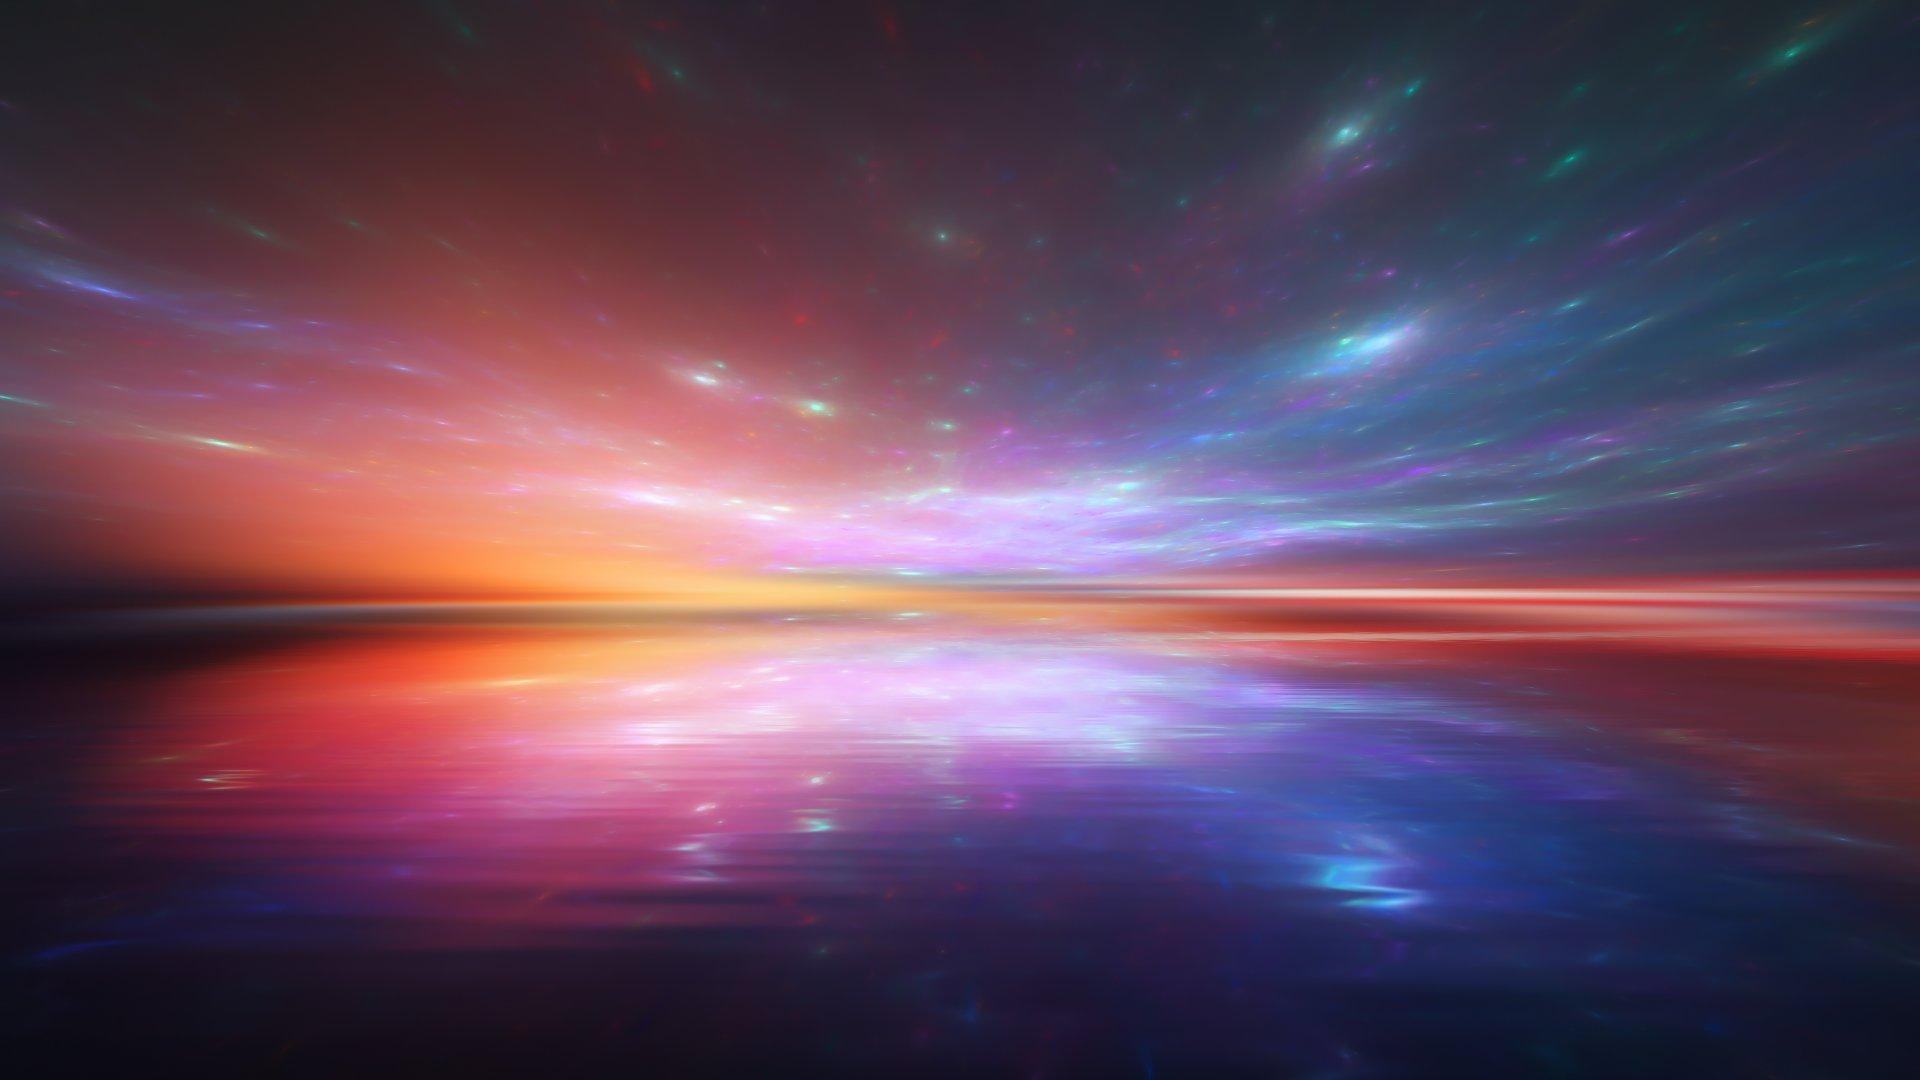 Heartlights Nancy Joy Hefron colorful sunset header